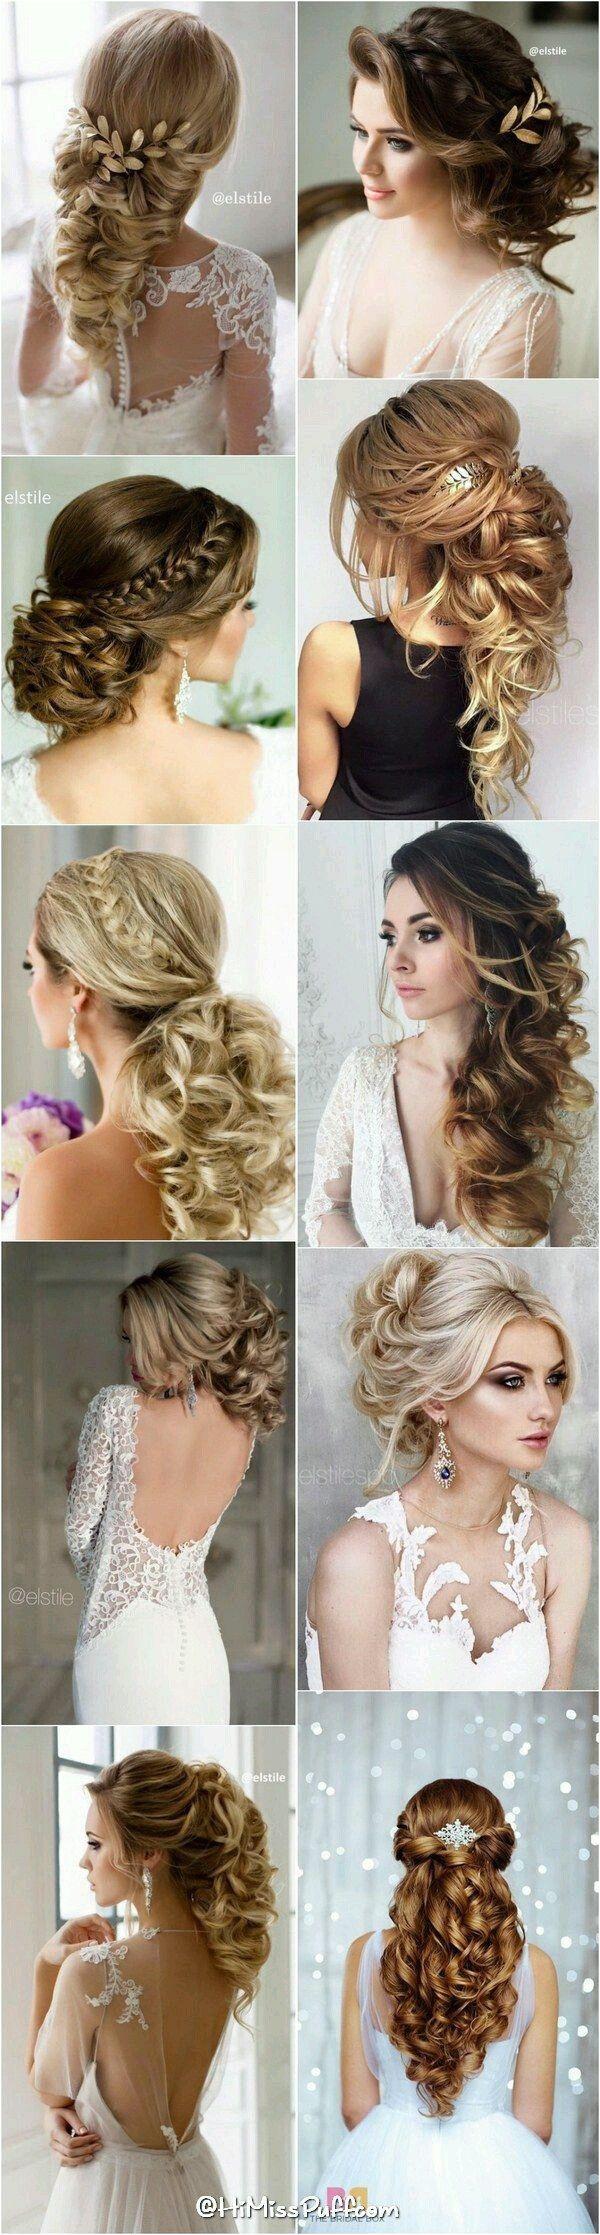 Arabic hair styles for wedding day